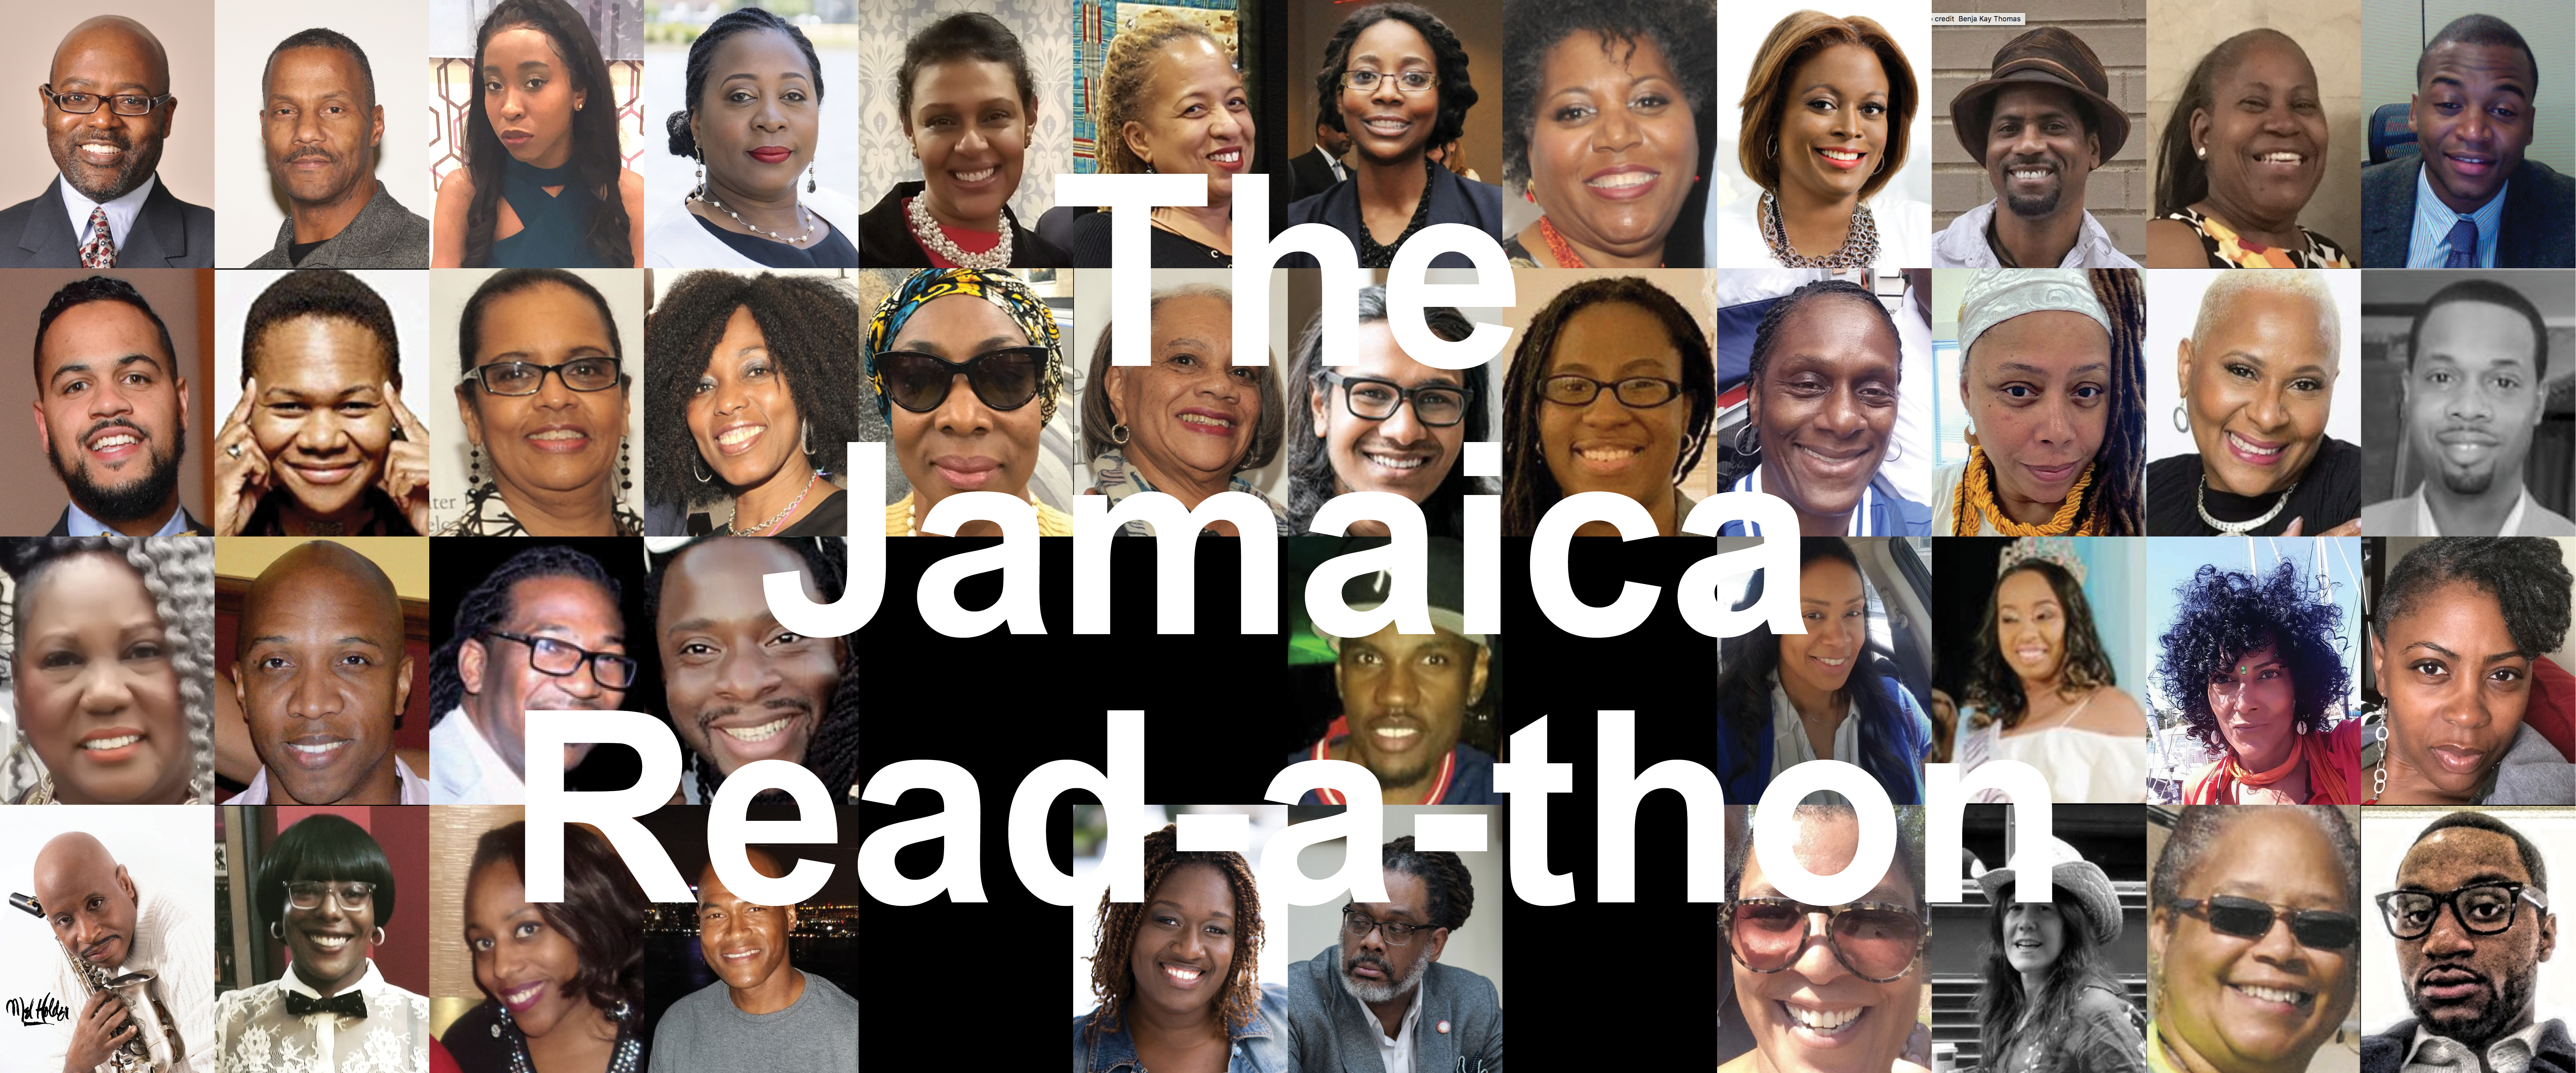 thejamaicareadathonwithfaces-1